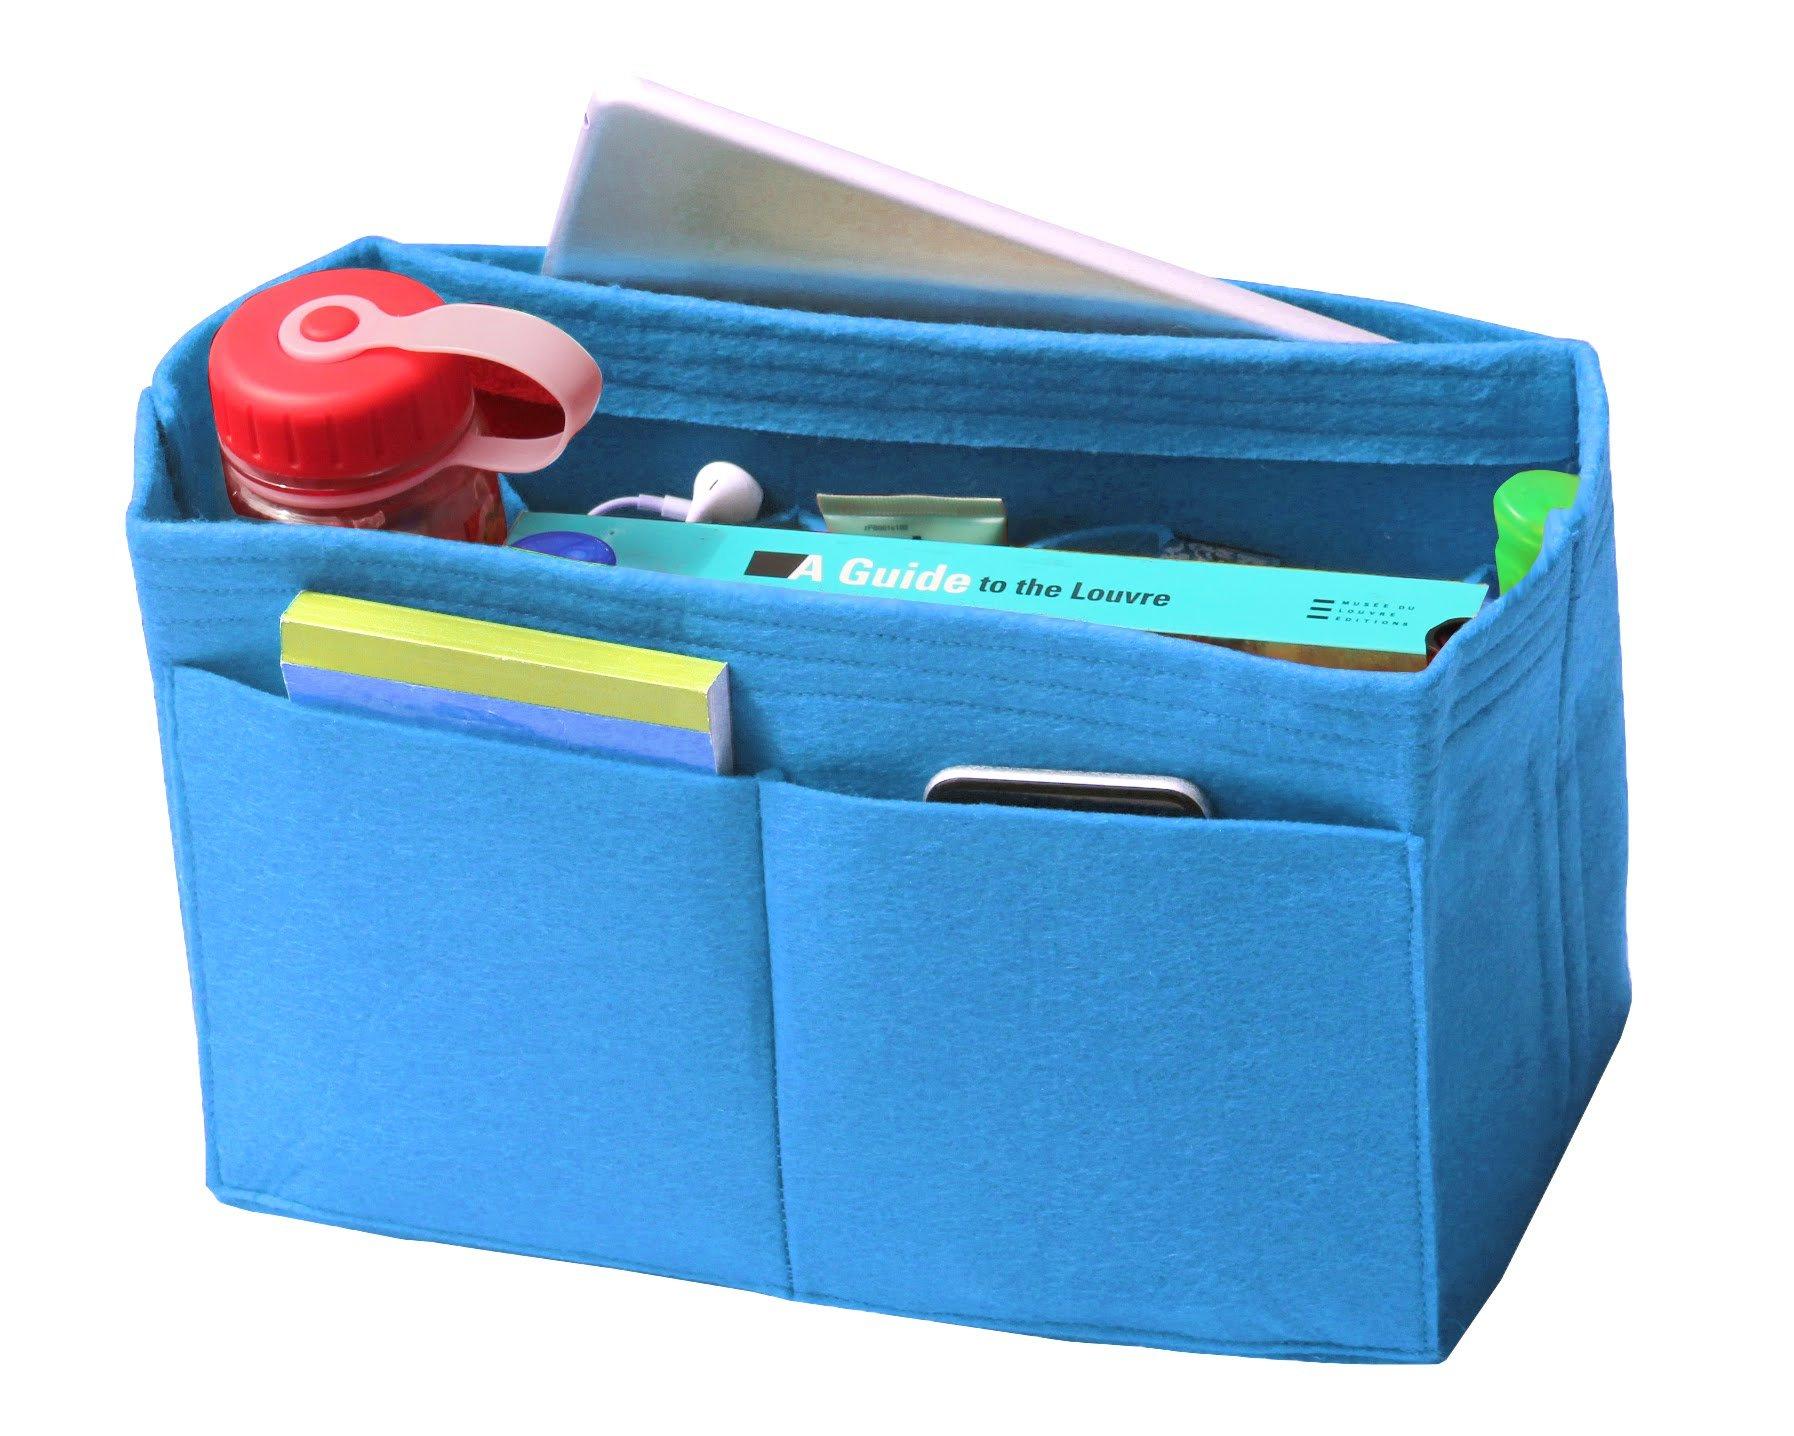 [Fits Various Bags, L.V Her.mes Long.champ Go.yard] Felt Tote Organizer (w/Milk Water Bottle Holder), Purse Insert, Cosmetic Makeup Diaper Handbag, Belongings Pocket